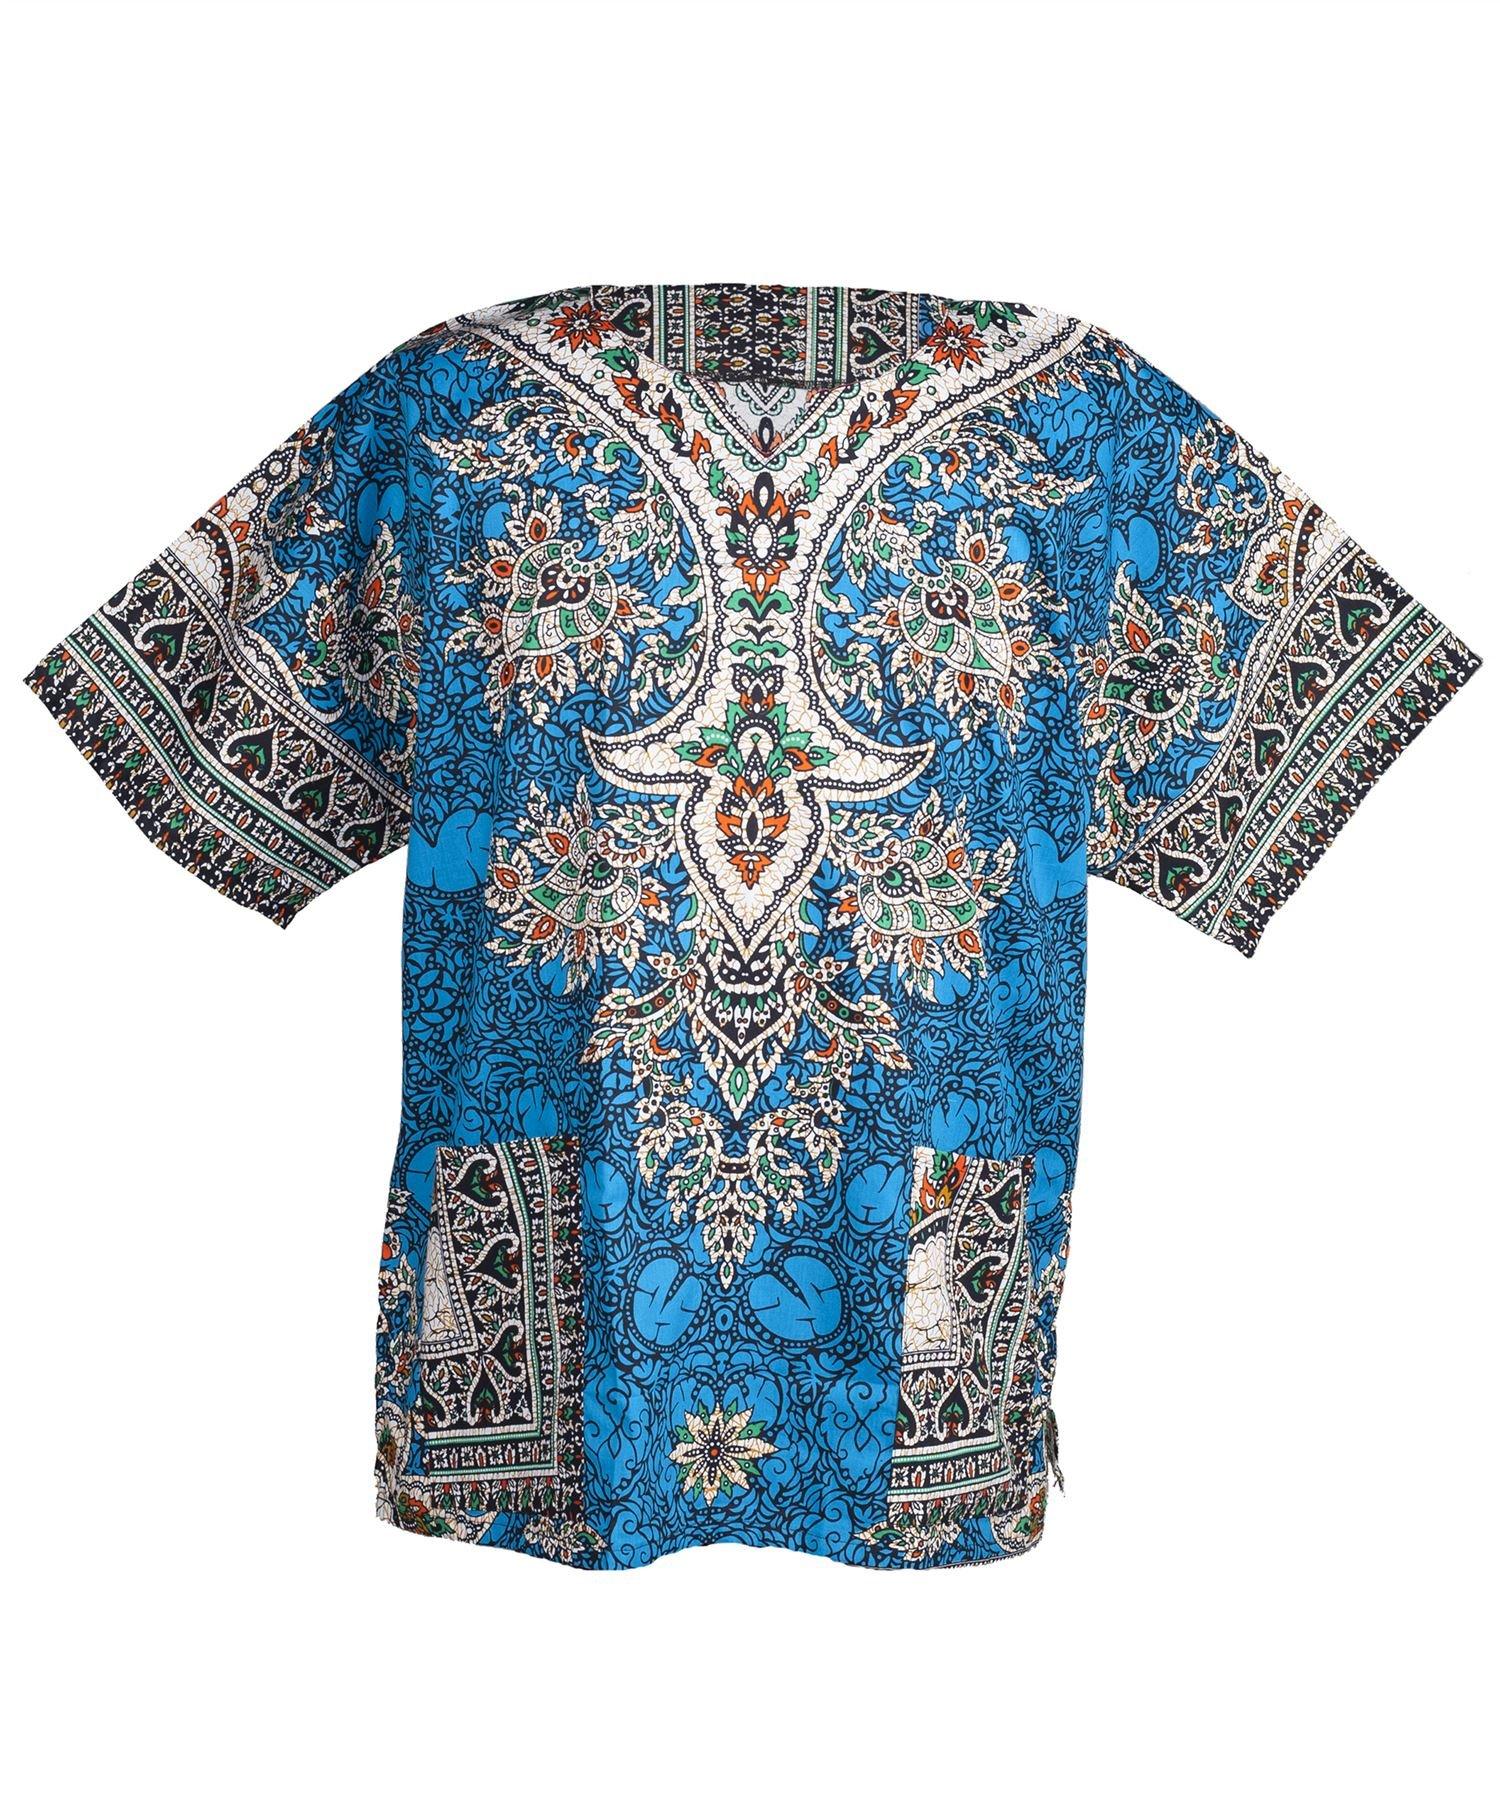 Lofbaz Traditional African Print Unisex Dashiki Ethnic Size XXL Blue